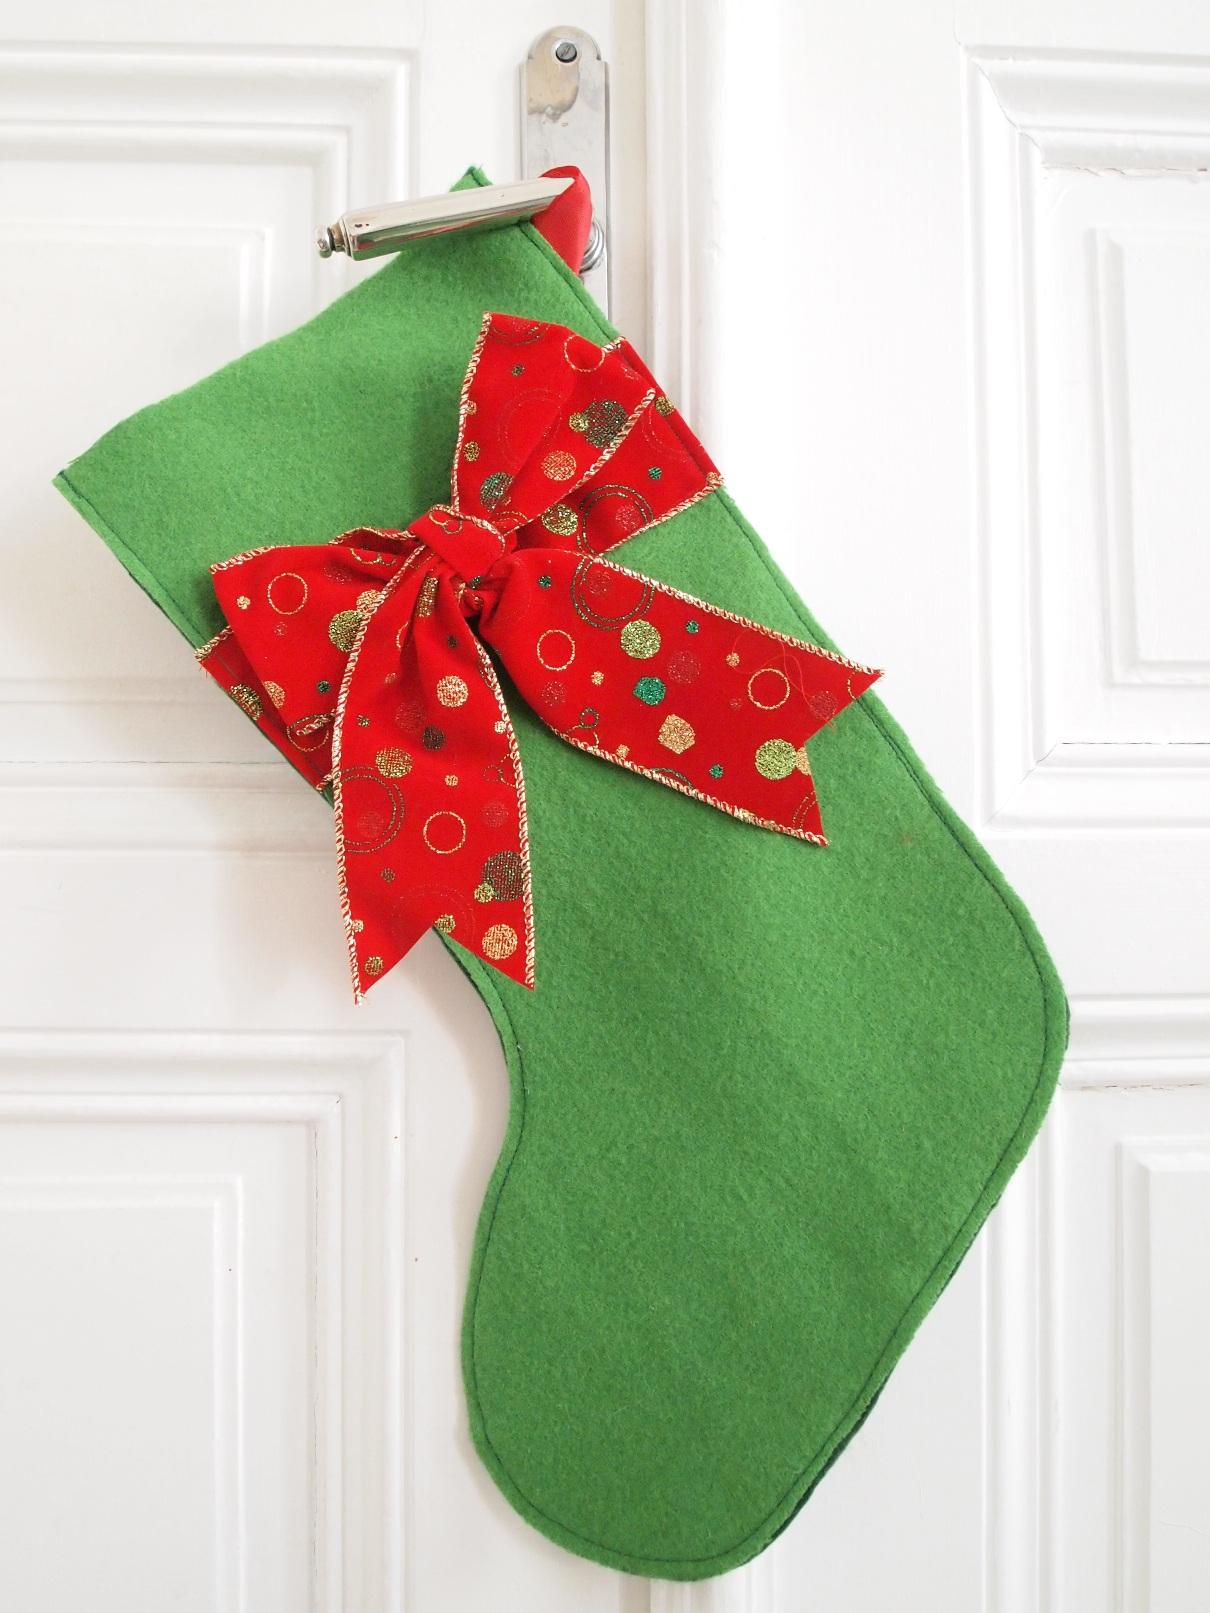 Christmas Stockings nähen Ideen für DIY